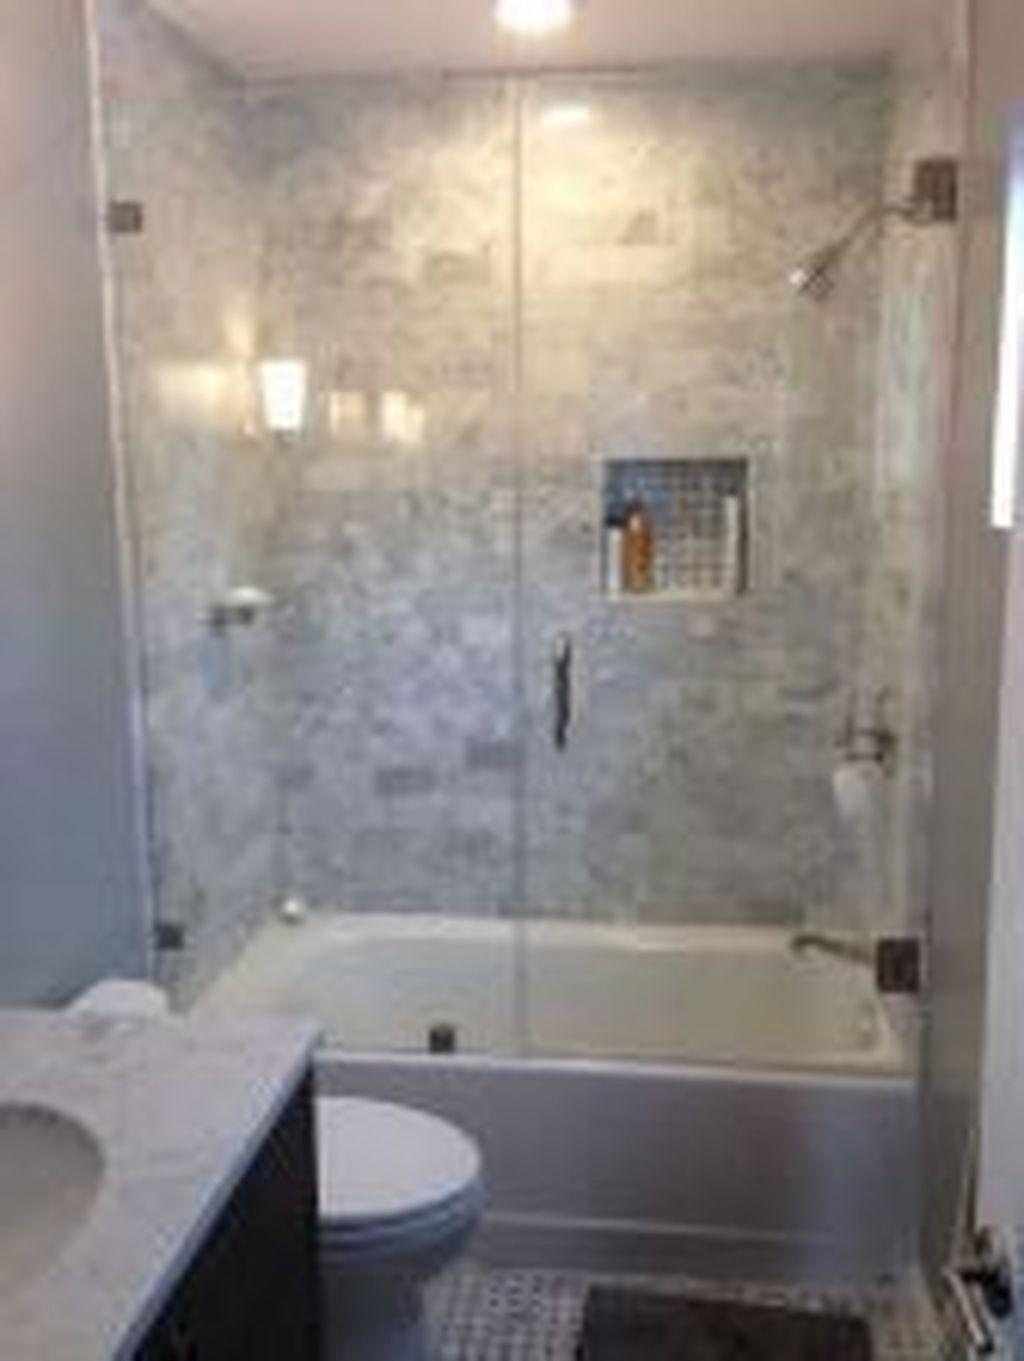 34 Fabulous Small Bathroom Tub Shower Combo Ideas In 2020 With Images Bathroom Design Small Bathroom Design Small Bathroom